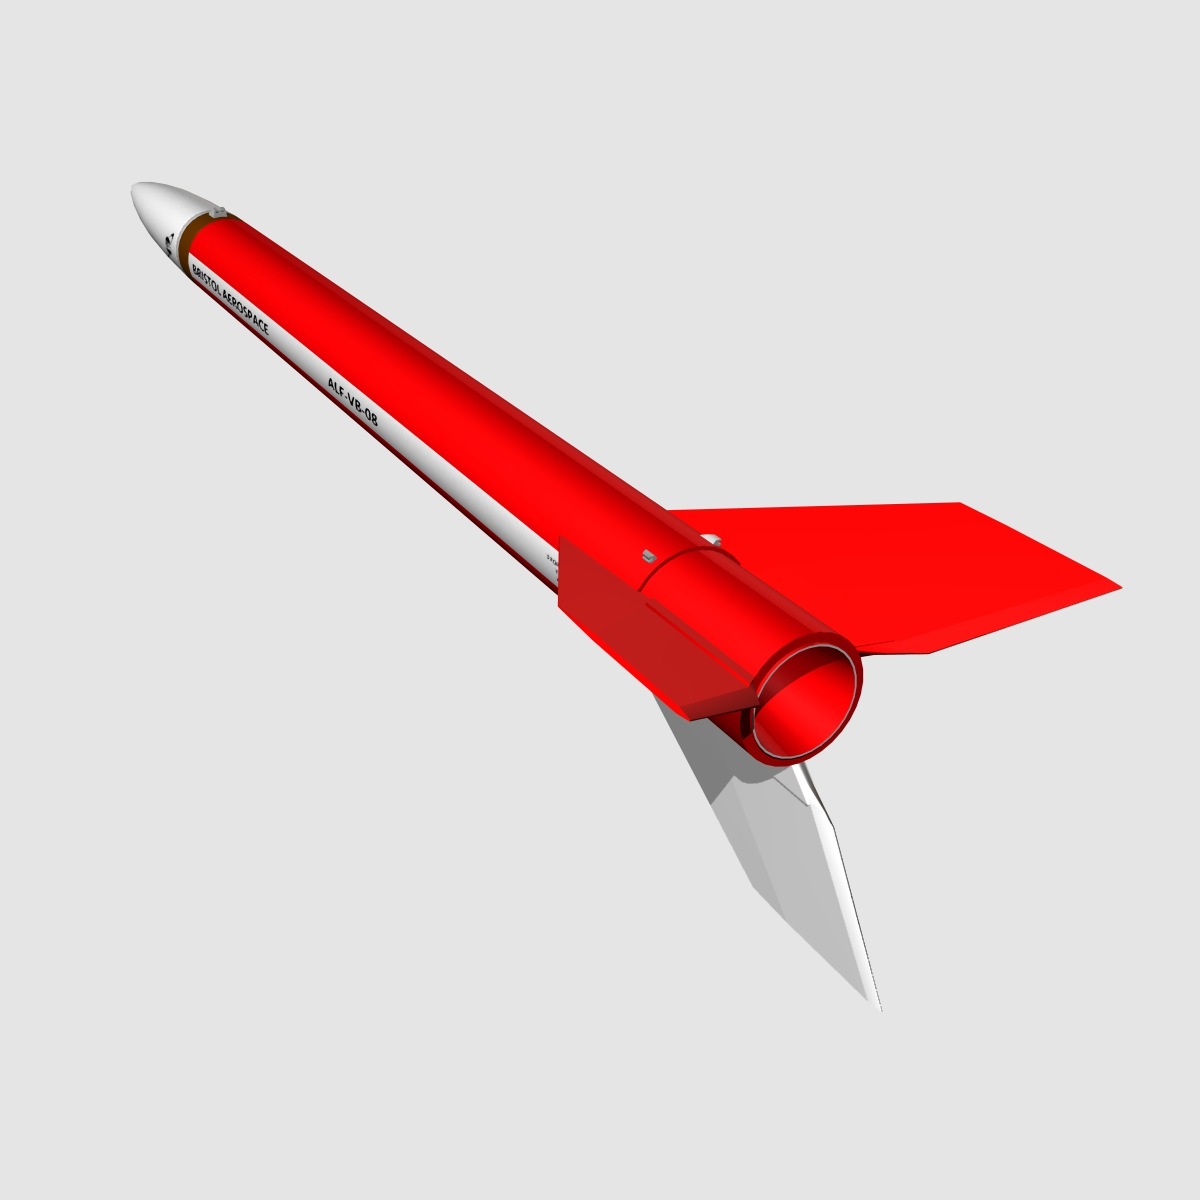 black brant vb sounding rocket 3d model 3ds dxf cob x obj 150870